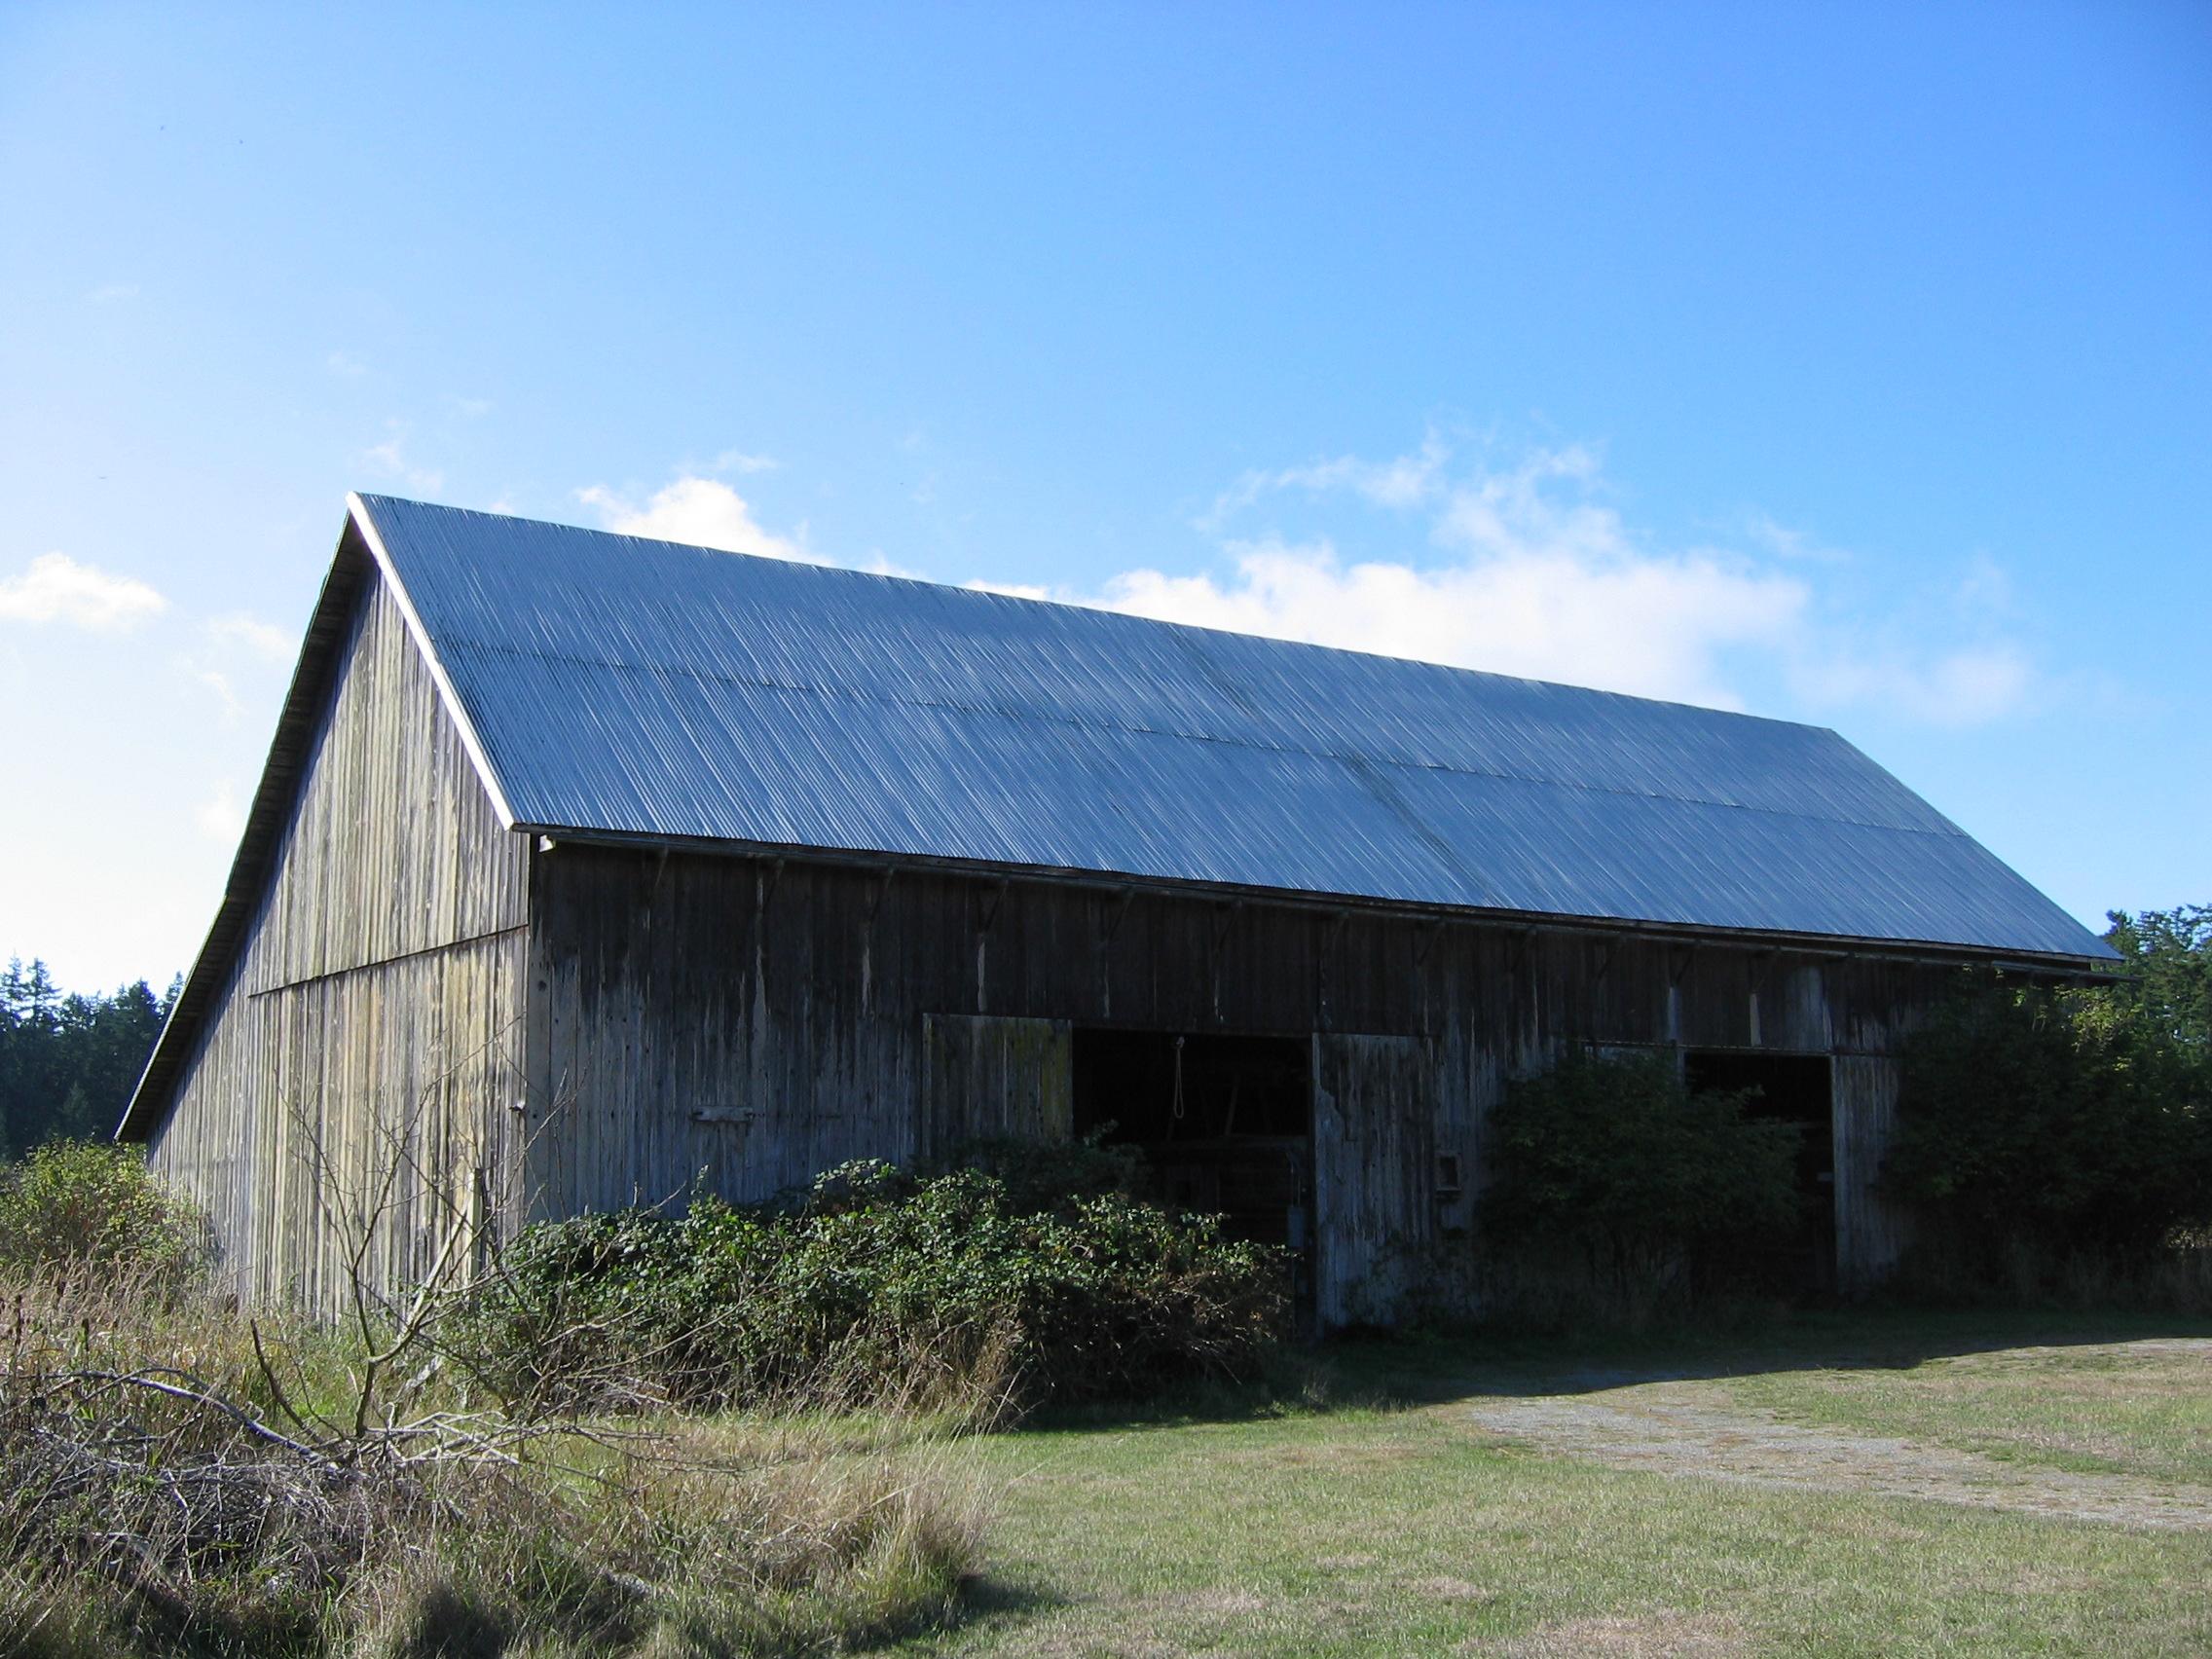 Broken Gable Historic Barns Of The San Juan Islands